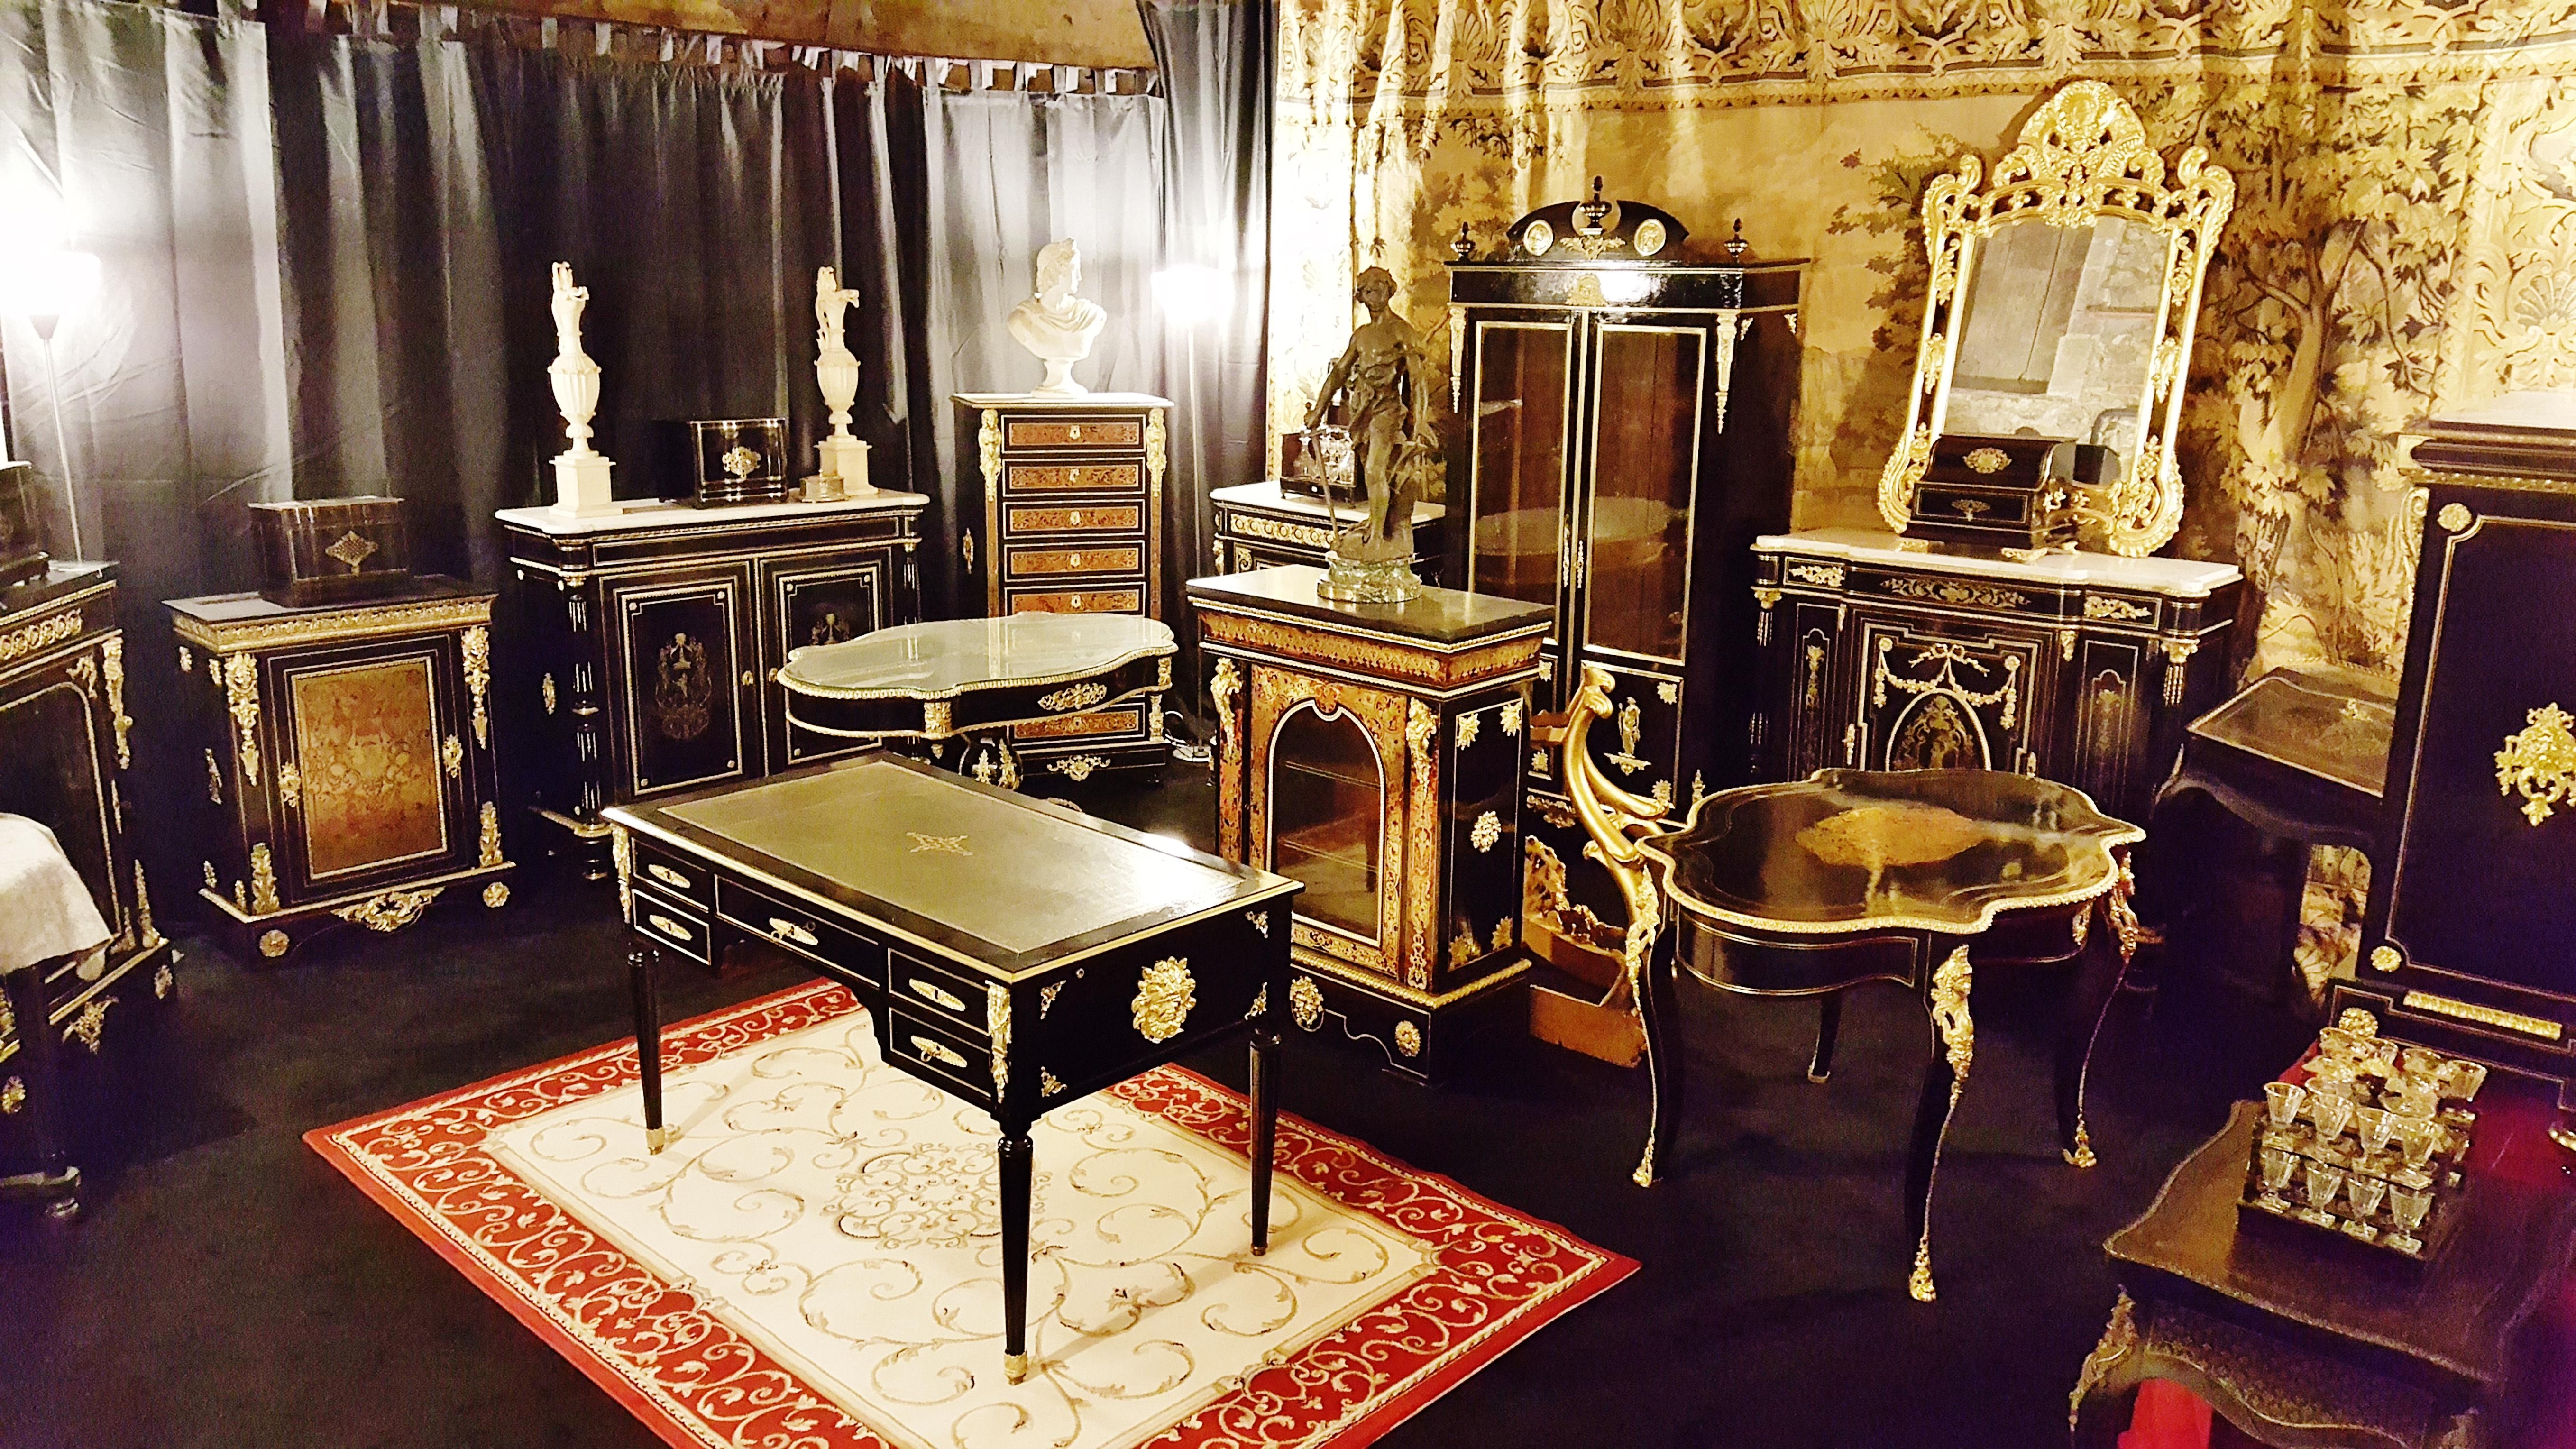 nouveau showroom saintes 17 la galerie napol on 3. Black Bedroom Furniture Sets. Home Design Ideas